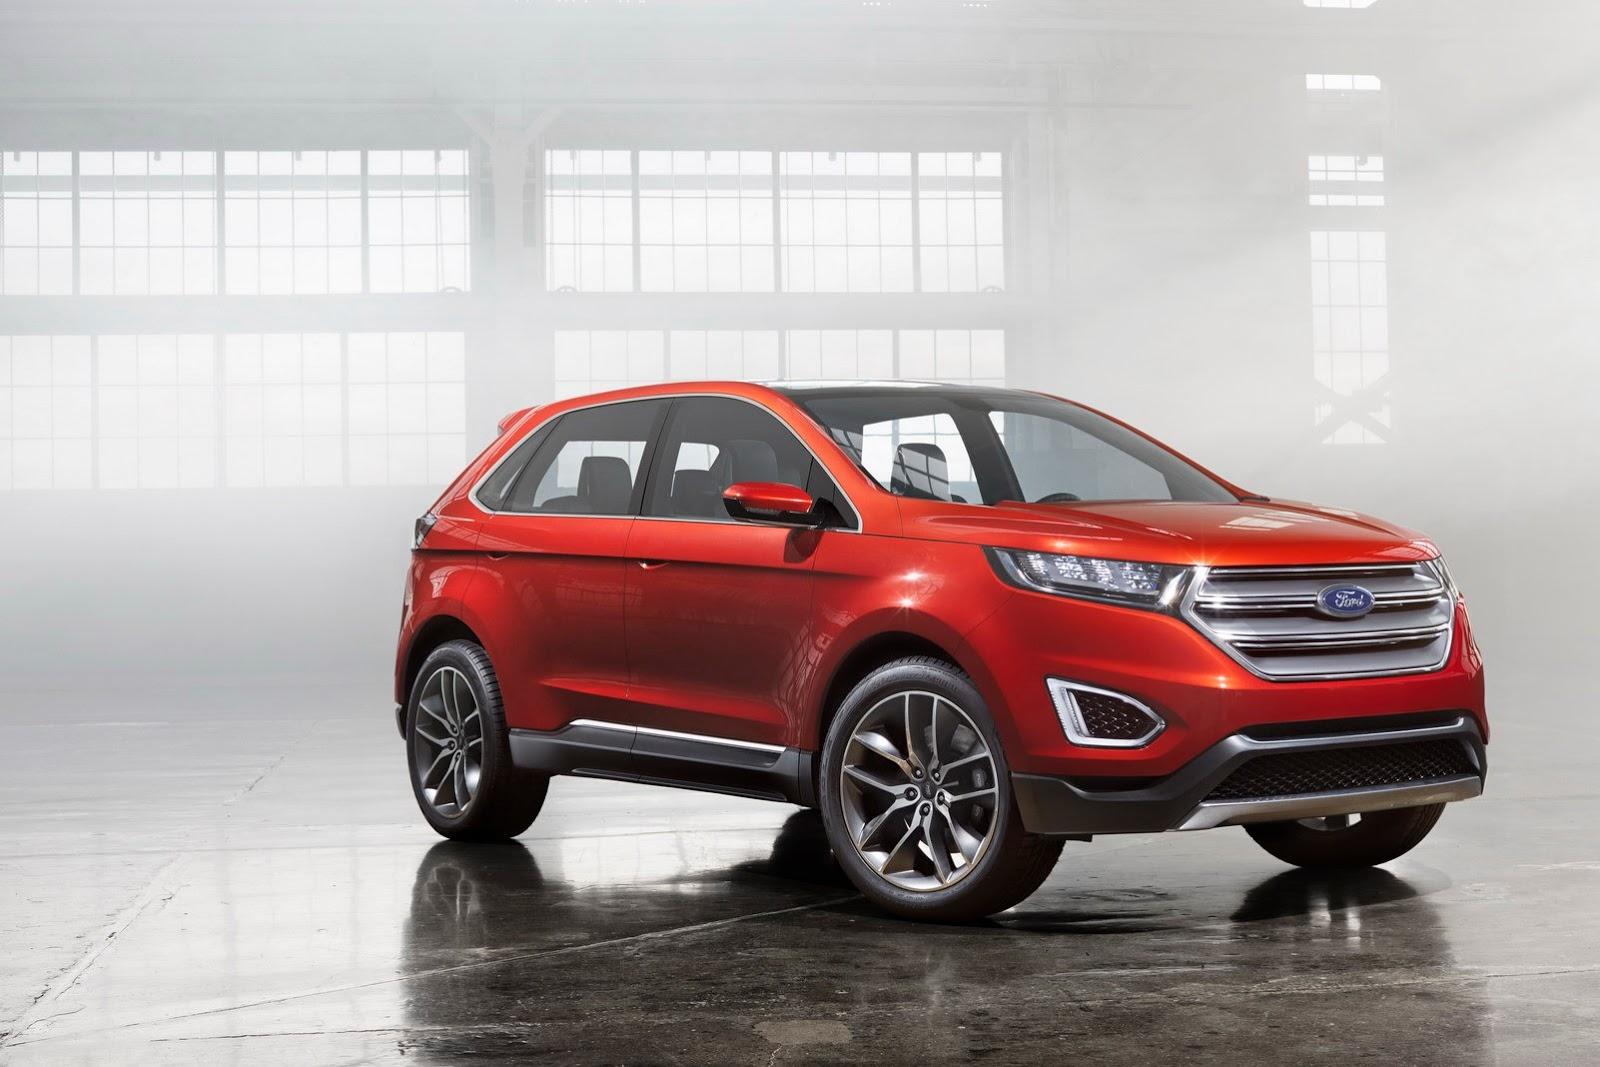 Ford-Edge-Concept-2015_14[2]